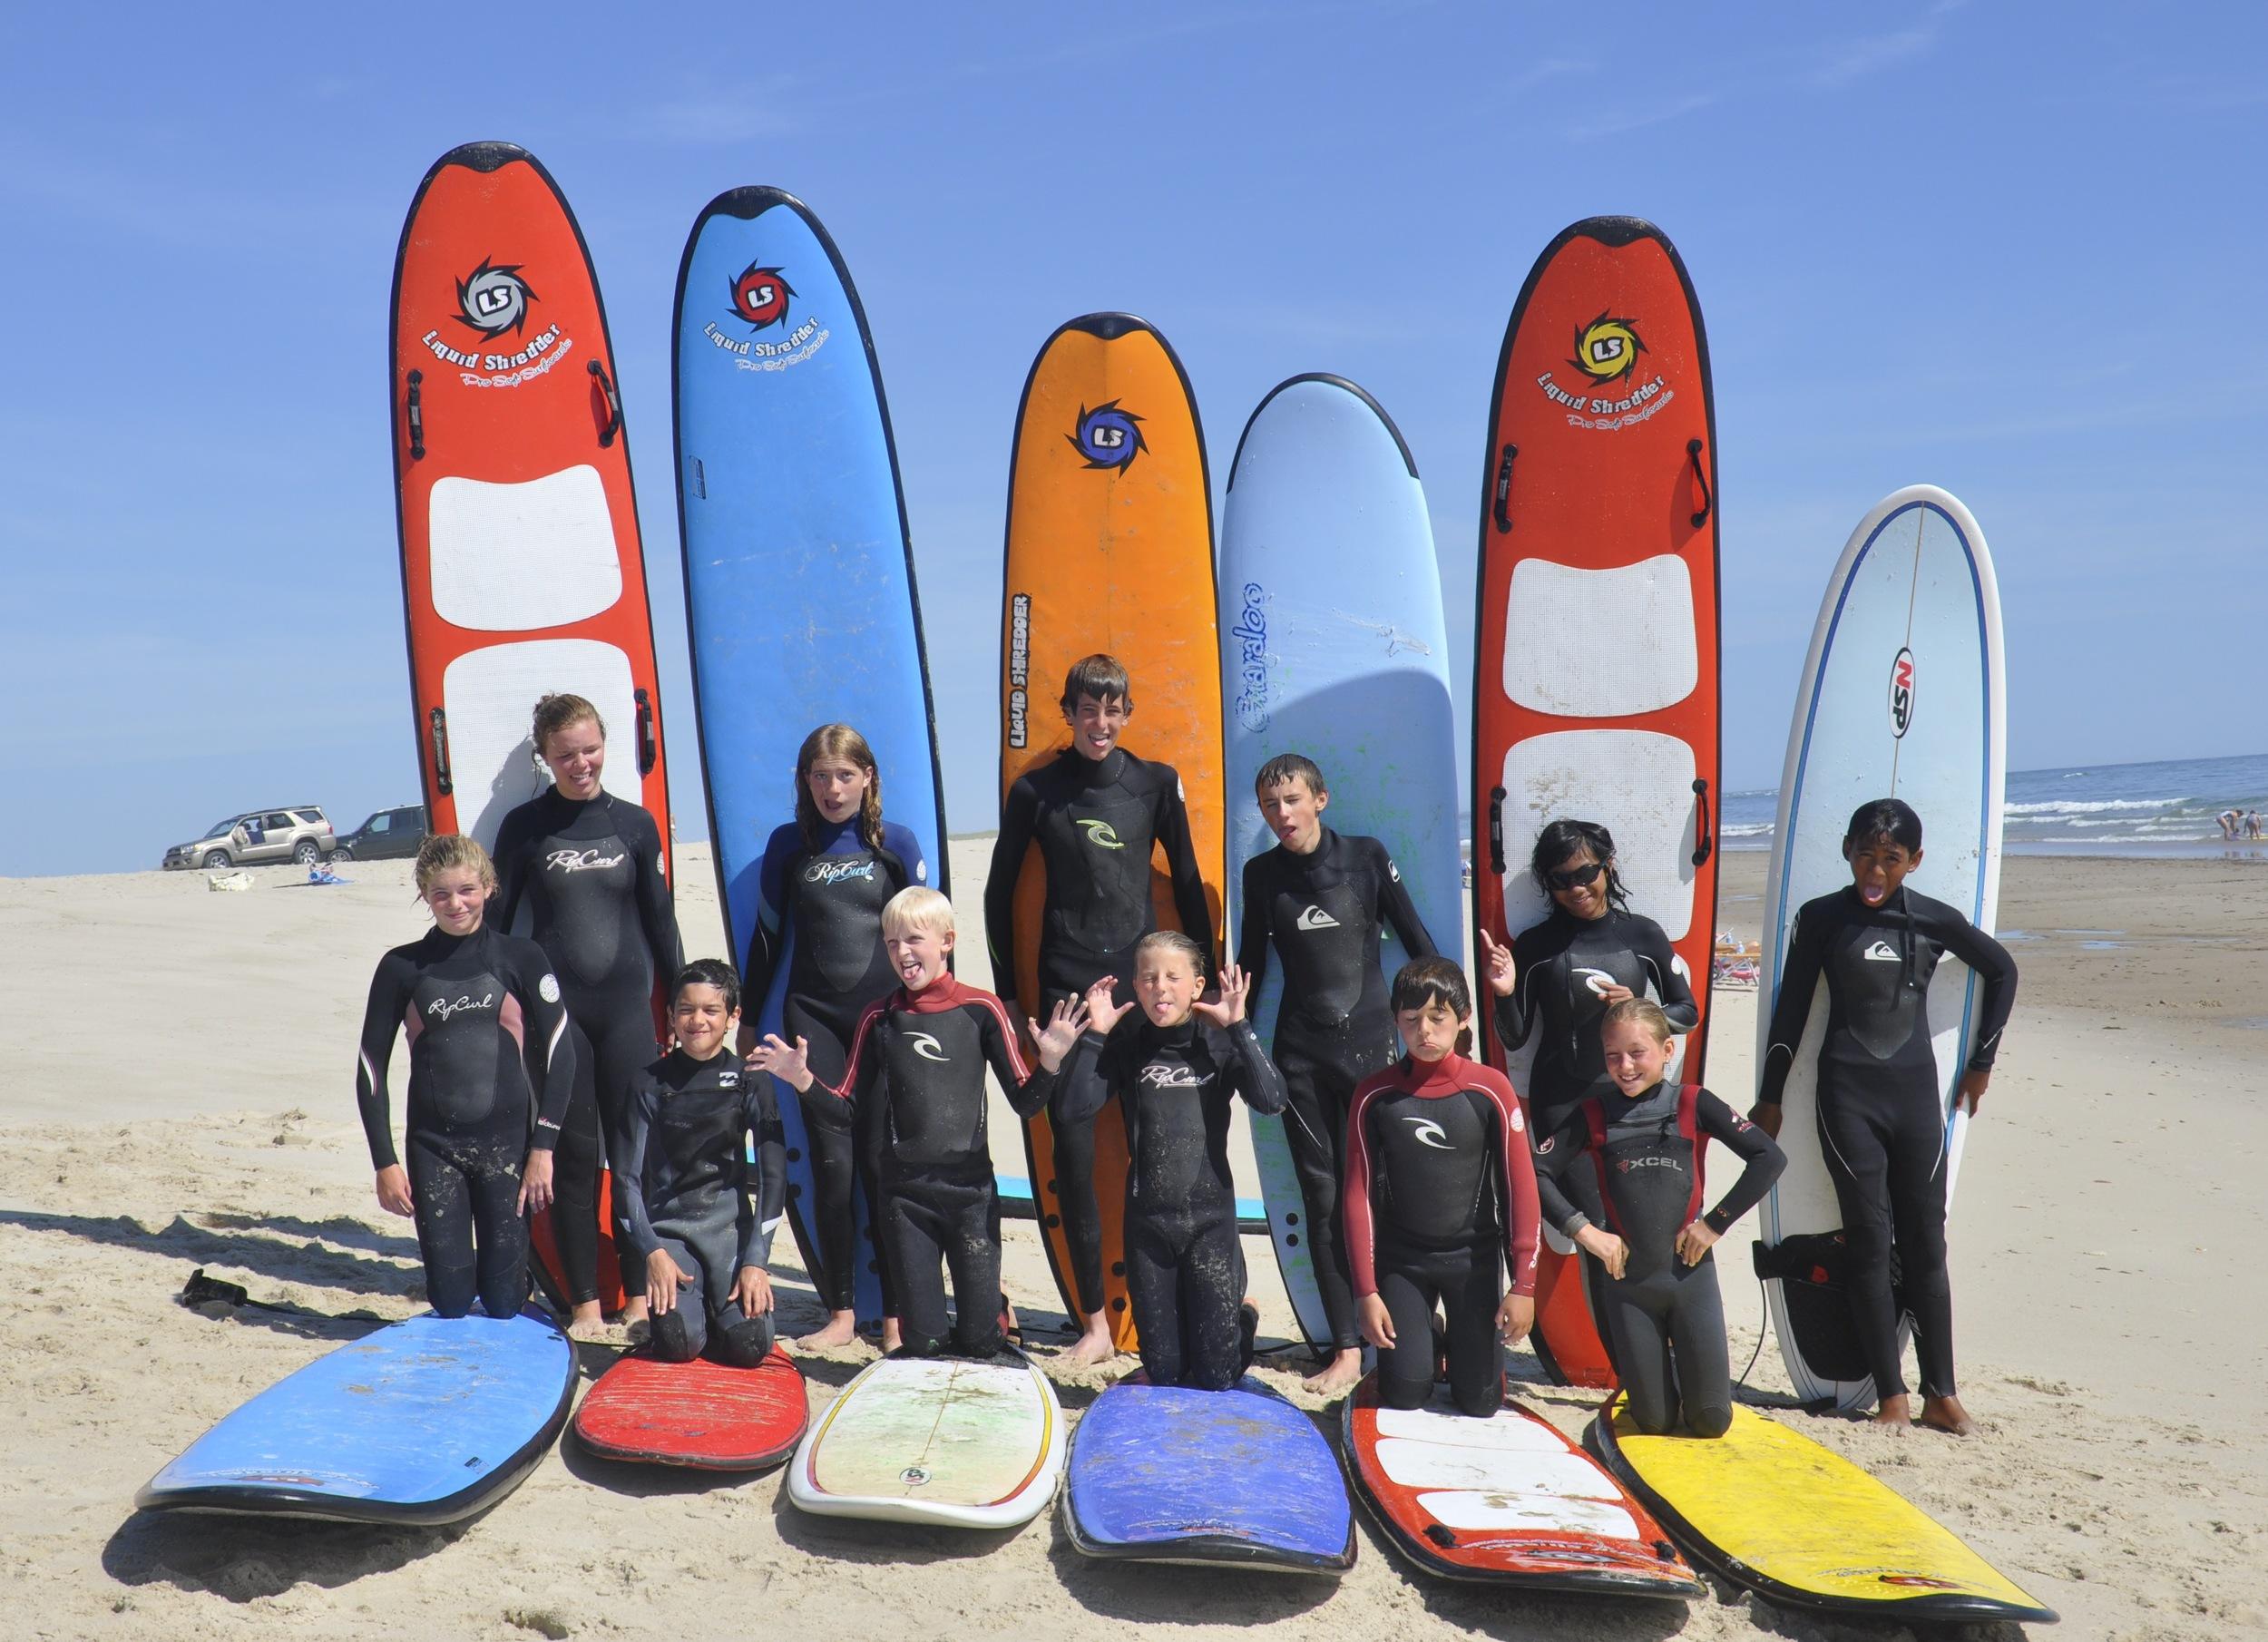 DAY-CAMP-CAPE-COD-SURF-CAMP.JPG